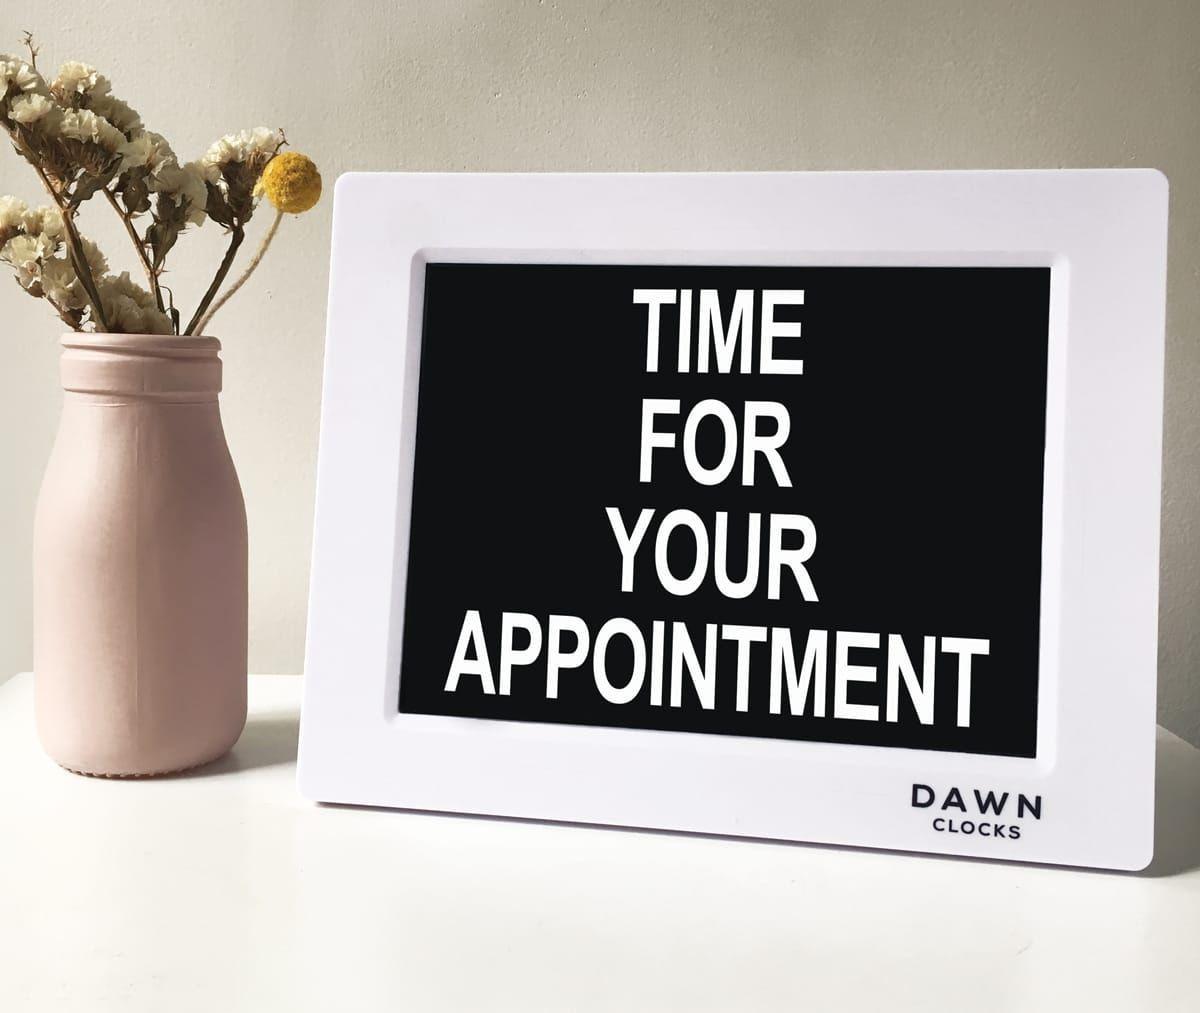 Dementia clock and reminder